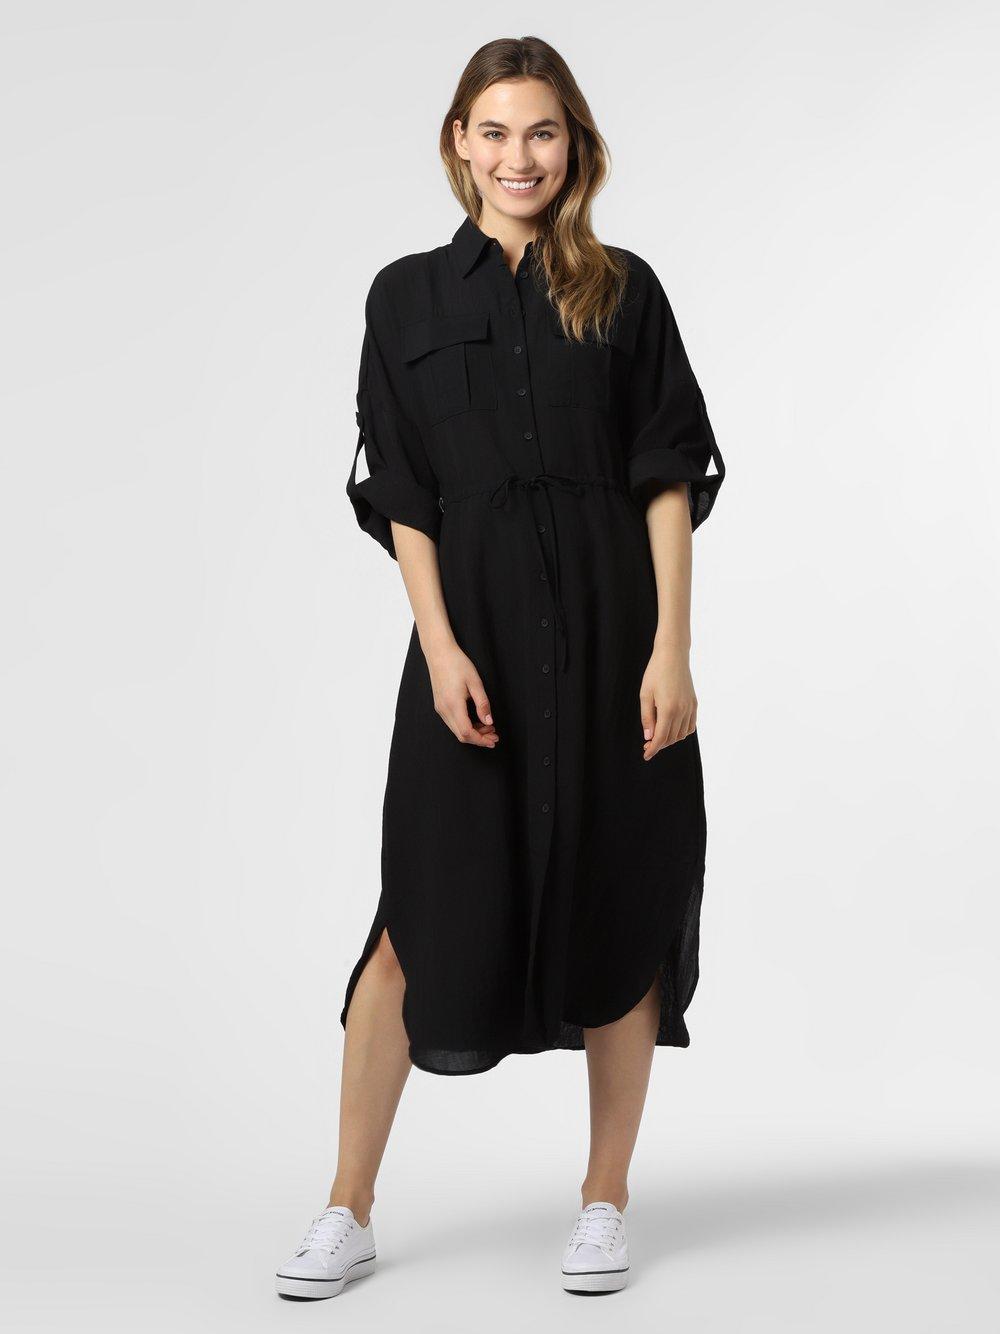 Minimum – Spodnie damskie – Spinosa, czarny Van Graaf 473310-0001-00380